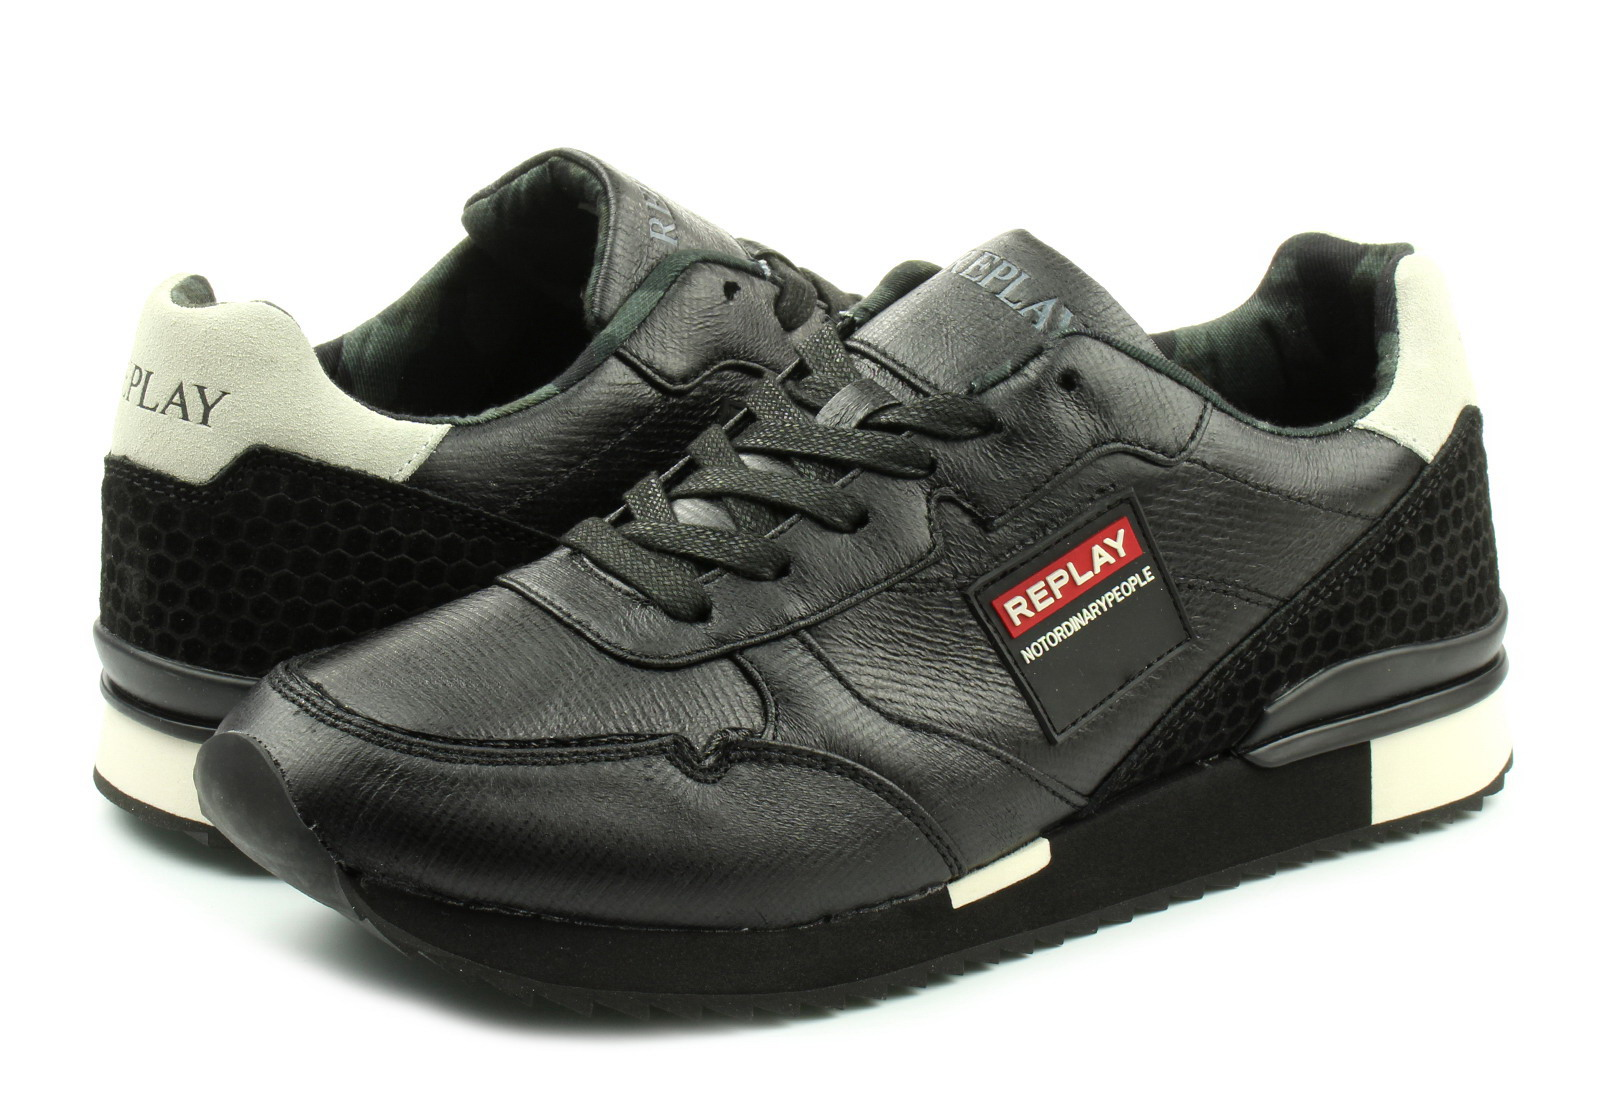 Replay Cipő - Rs680007t - RS680007T-0003 - Office Shoes Magyarország 33ab3f4489